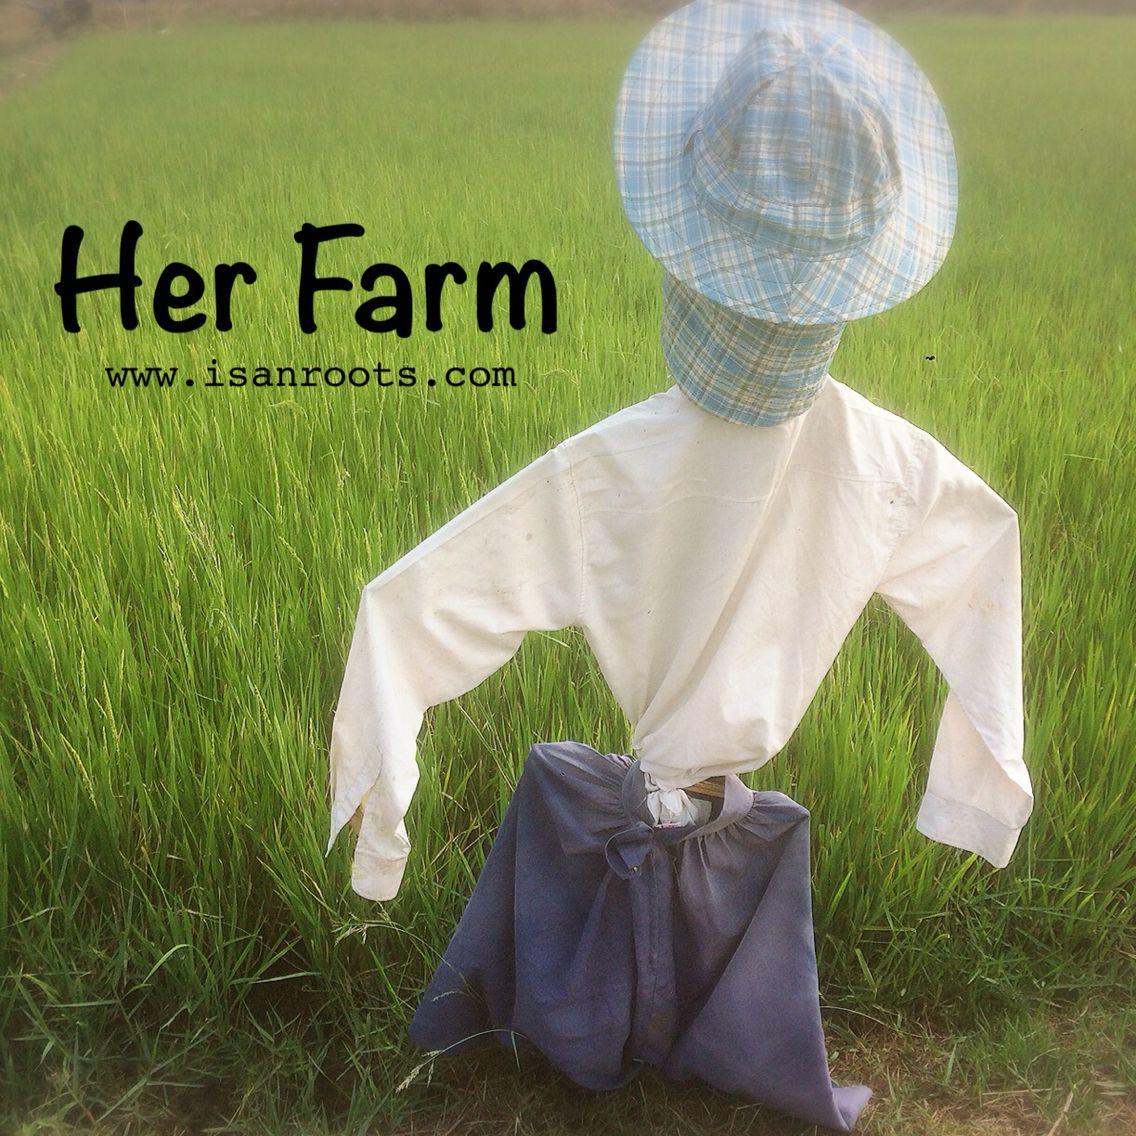 Her farm